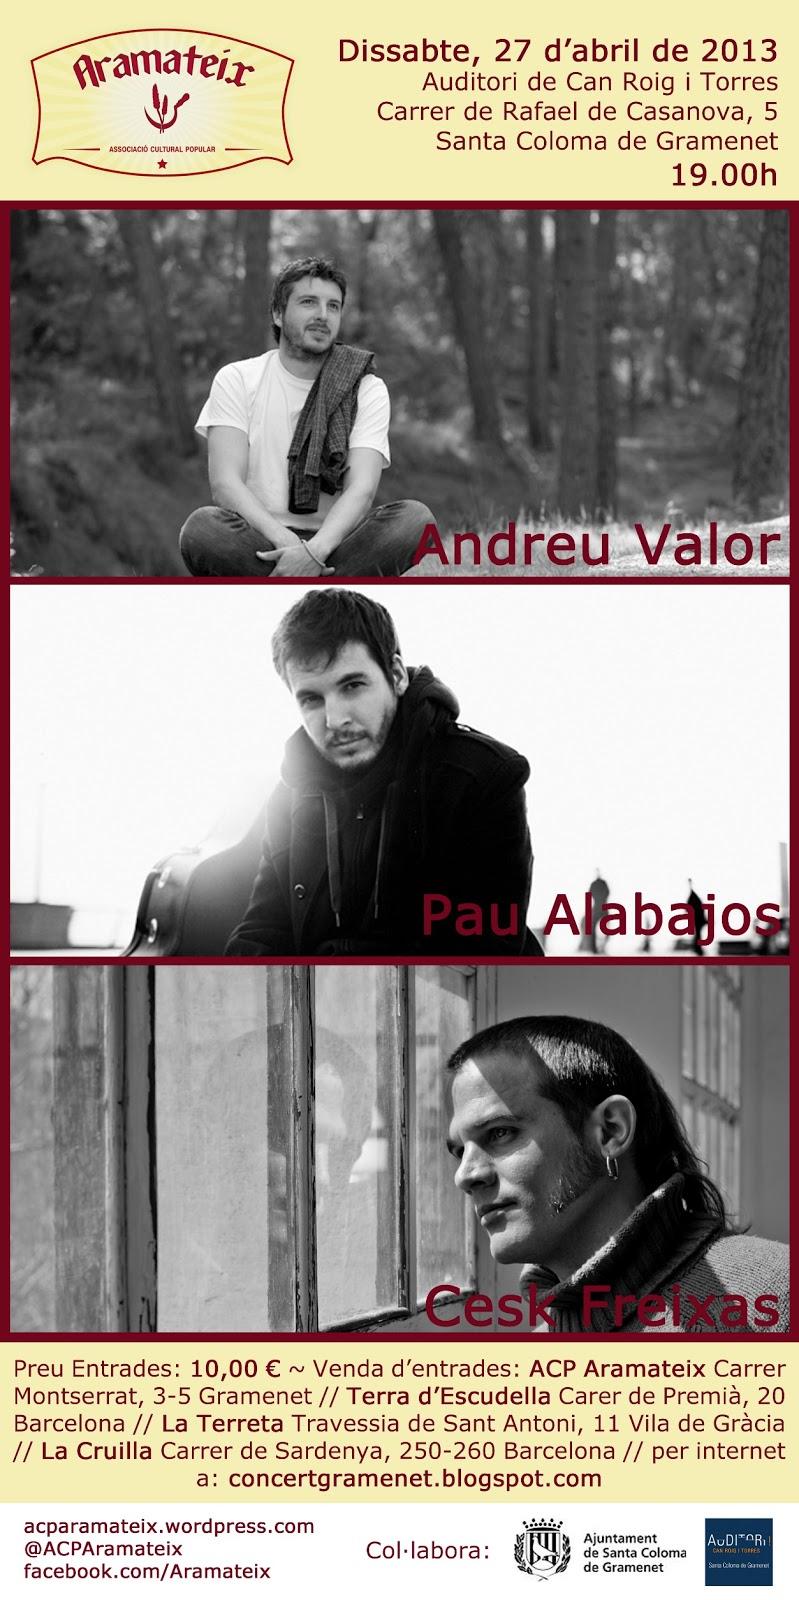 Dissabte 27Abril - Gramenet, concert conjunt de @ceskfreixas @paualabajos i @andreuvalor.